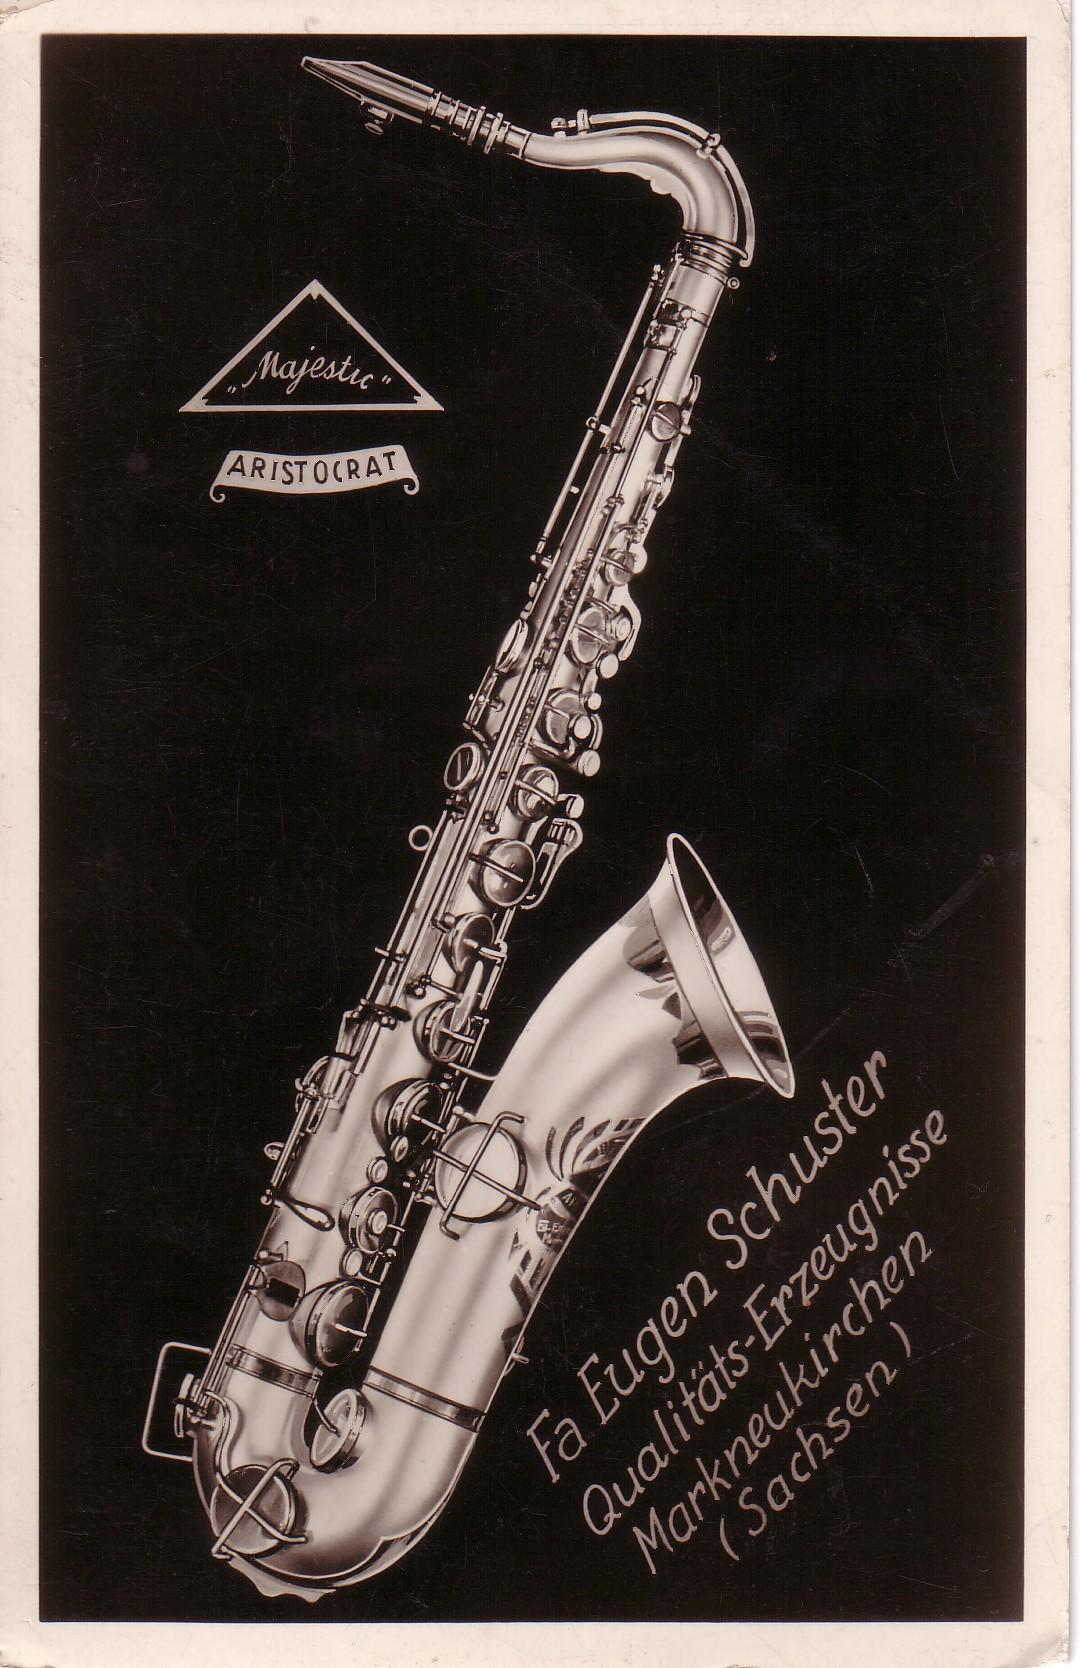 Eugen Schuster, vintage advertisement, Majestic Aristocrat, tenor saxophone, Markneukirchen